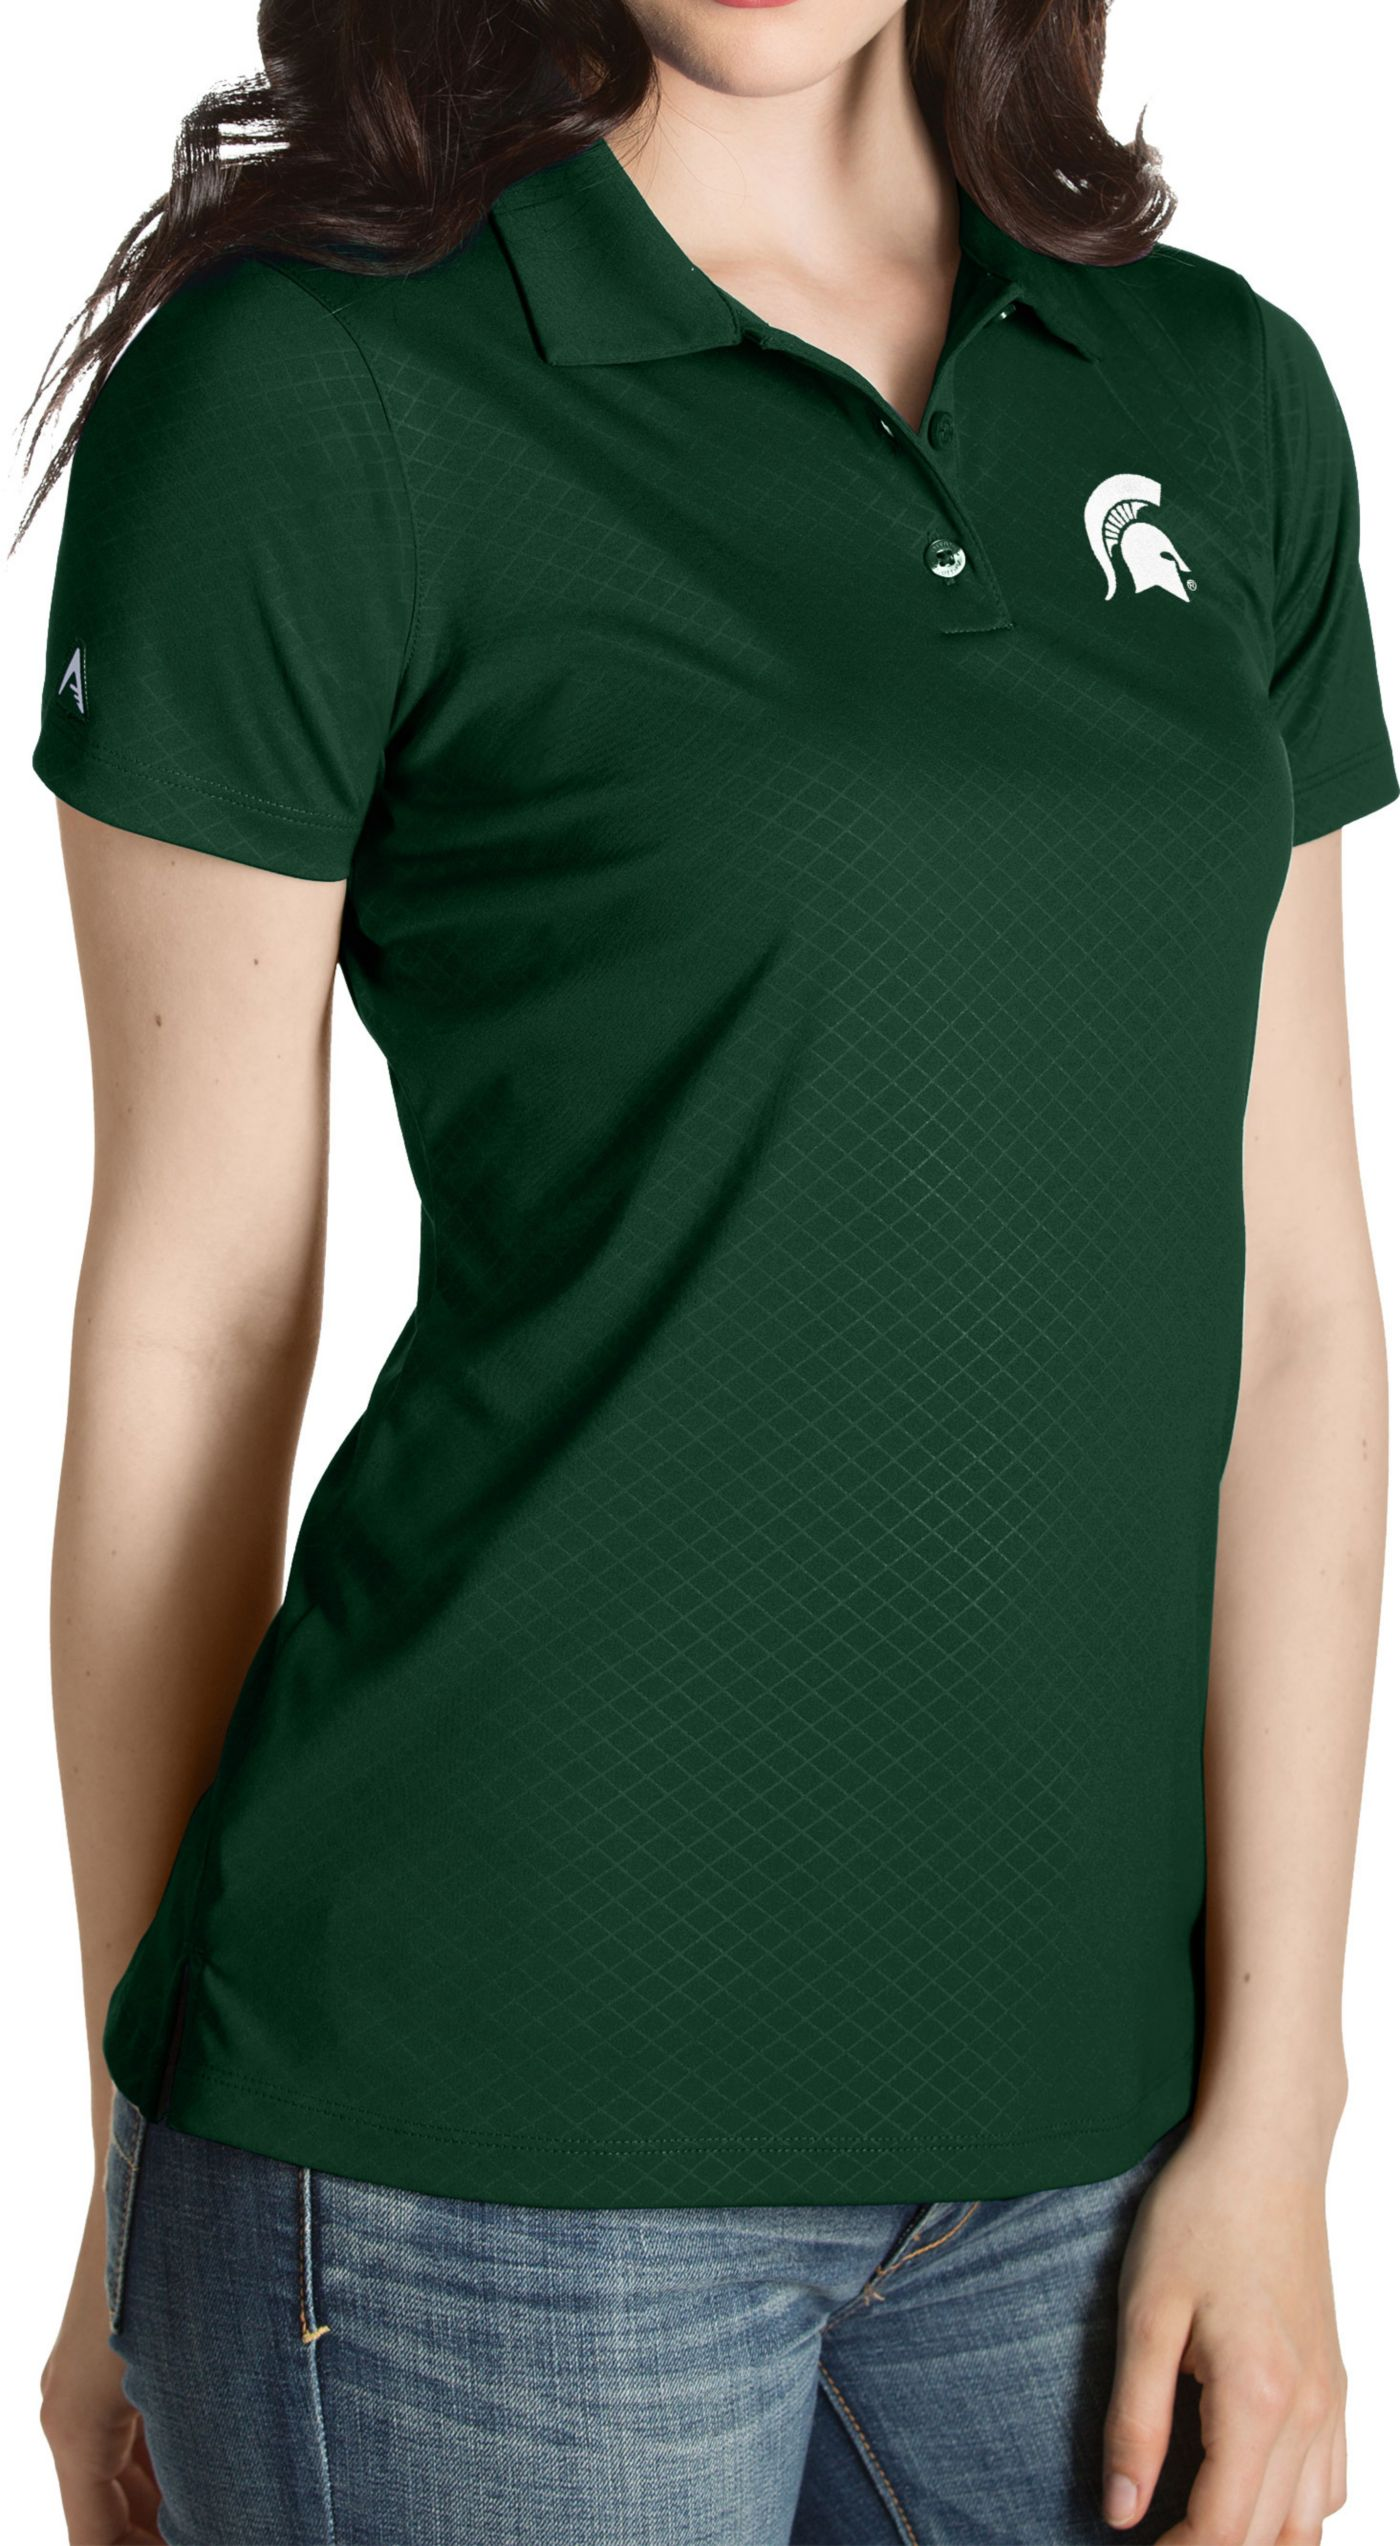 Antigua Women's Michigan State Spartans Green Inspire Performance Polo